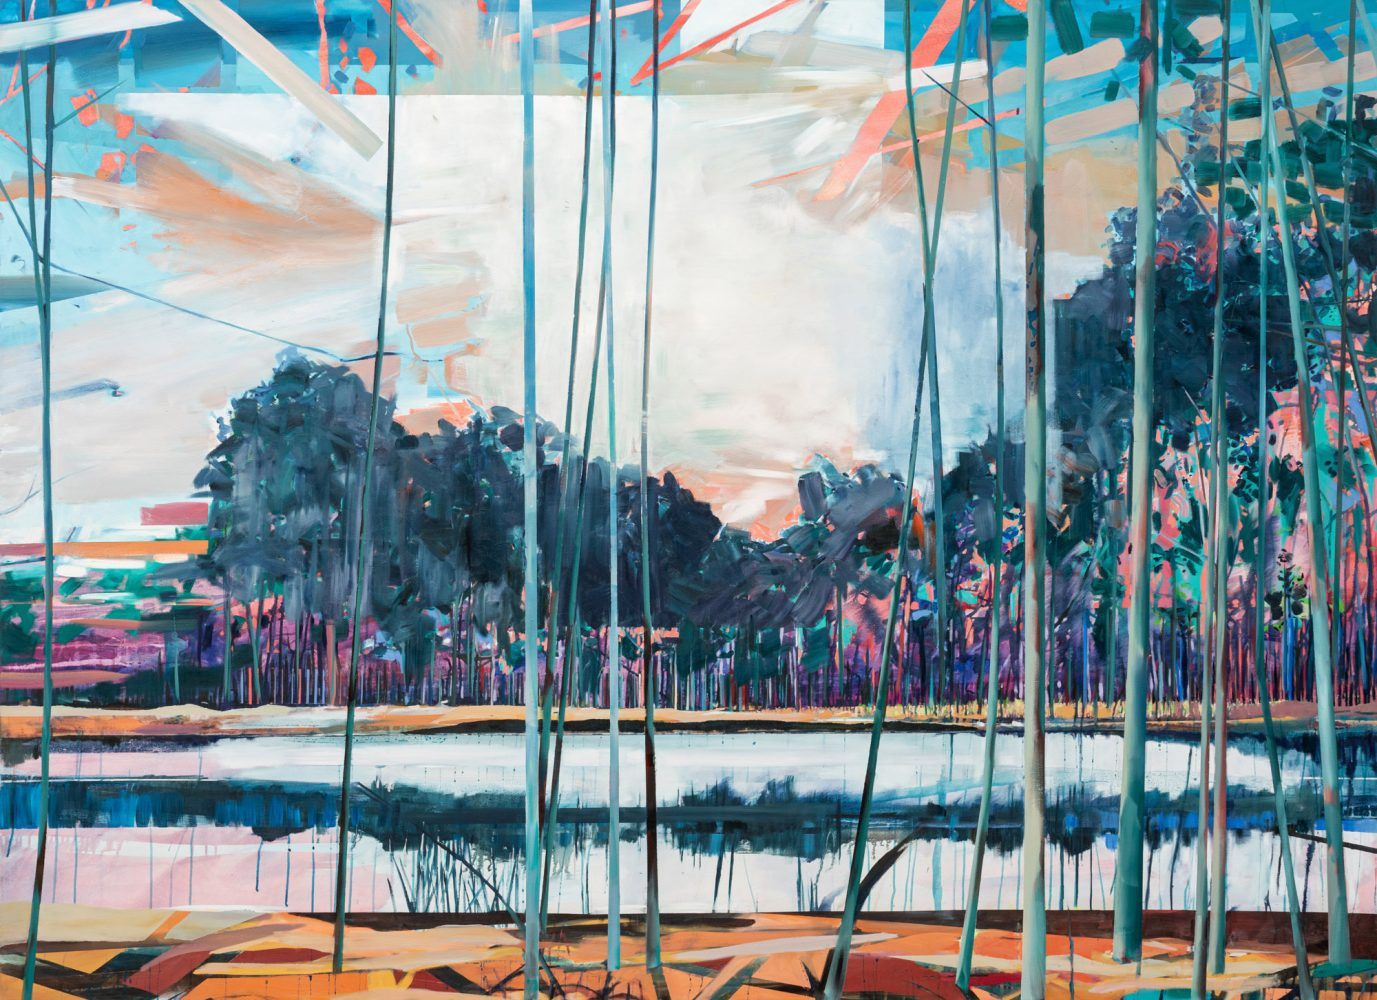 Theresa Möller -Spiegelflächen - 2021- Acryl and oil on canvas - 190x250cm